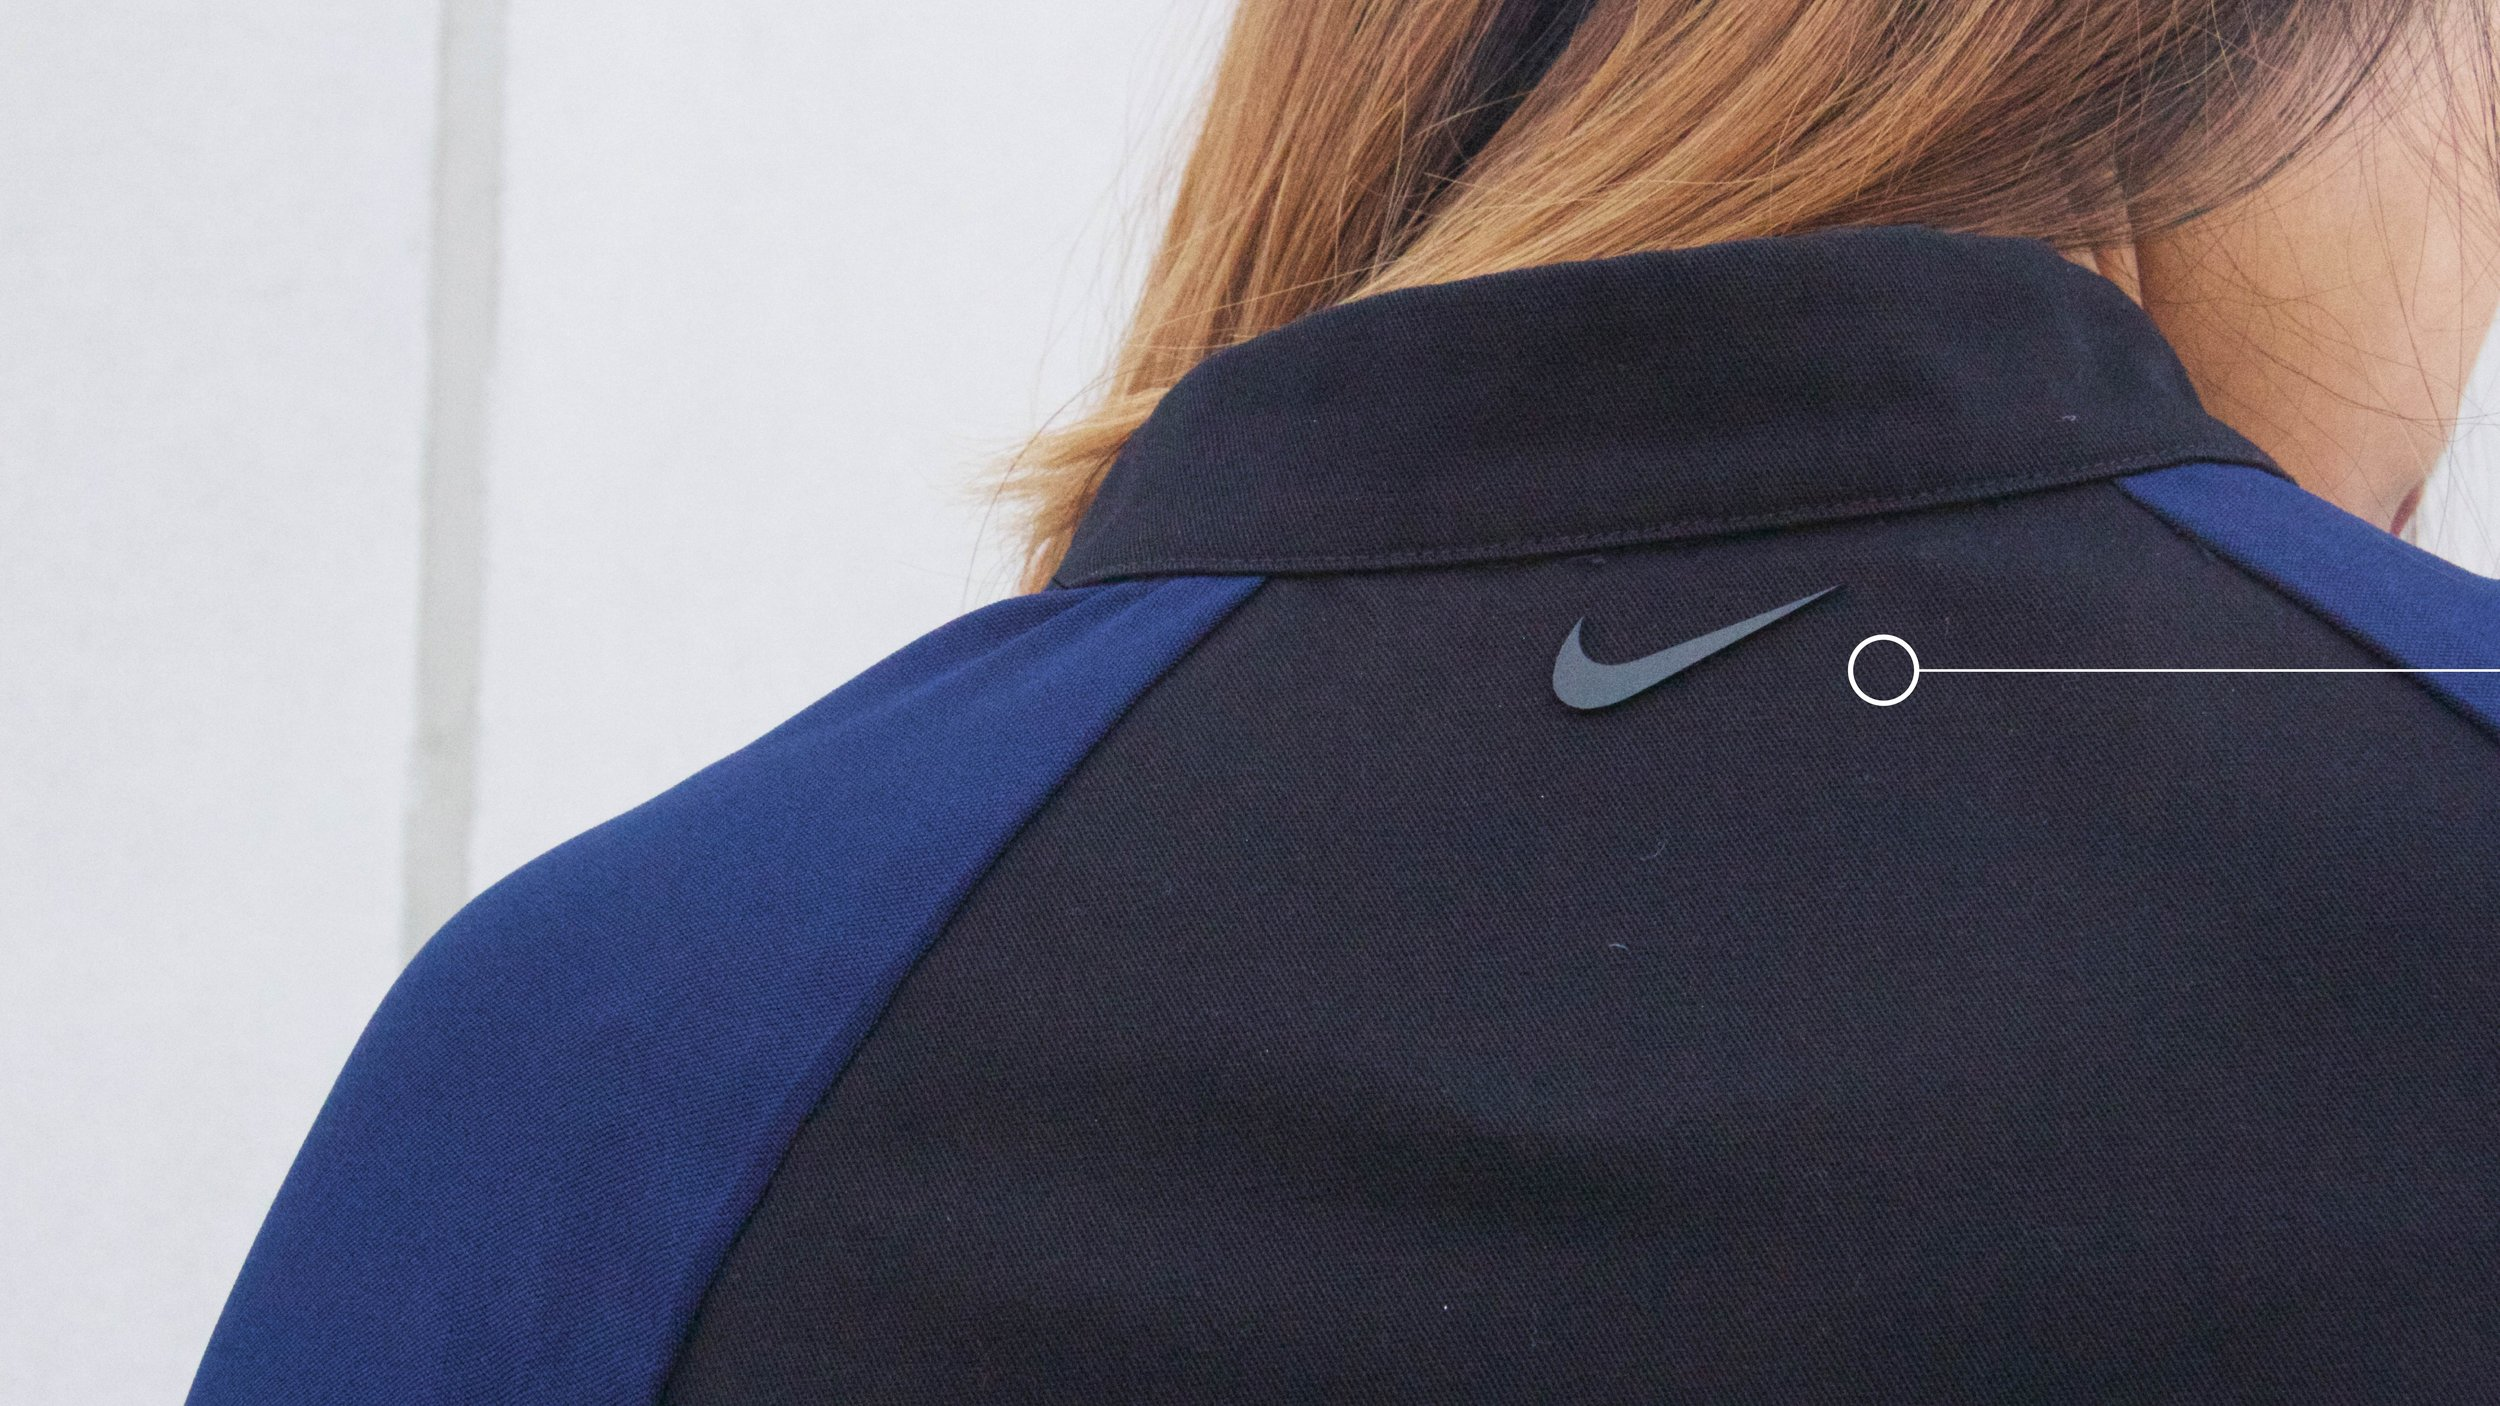 nike_logo-04.jpg